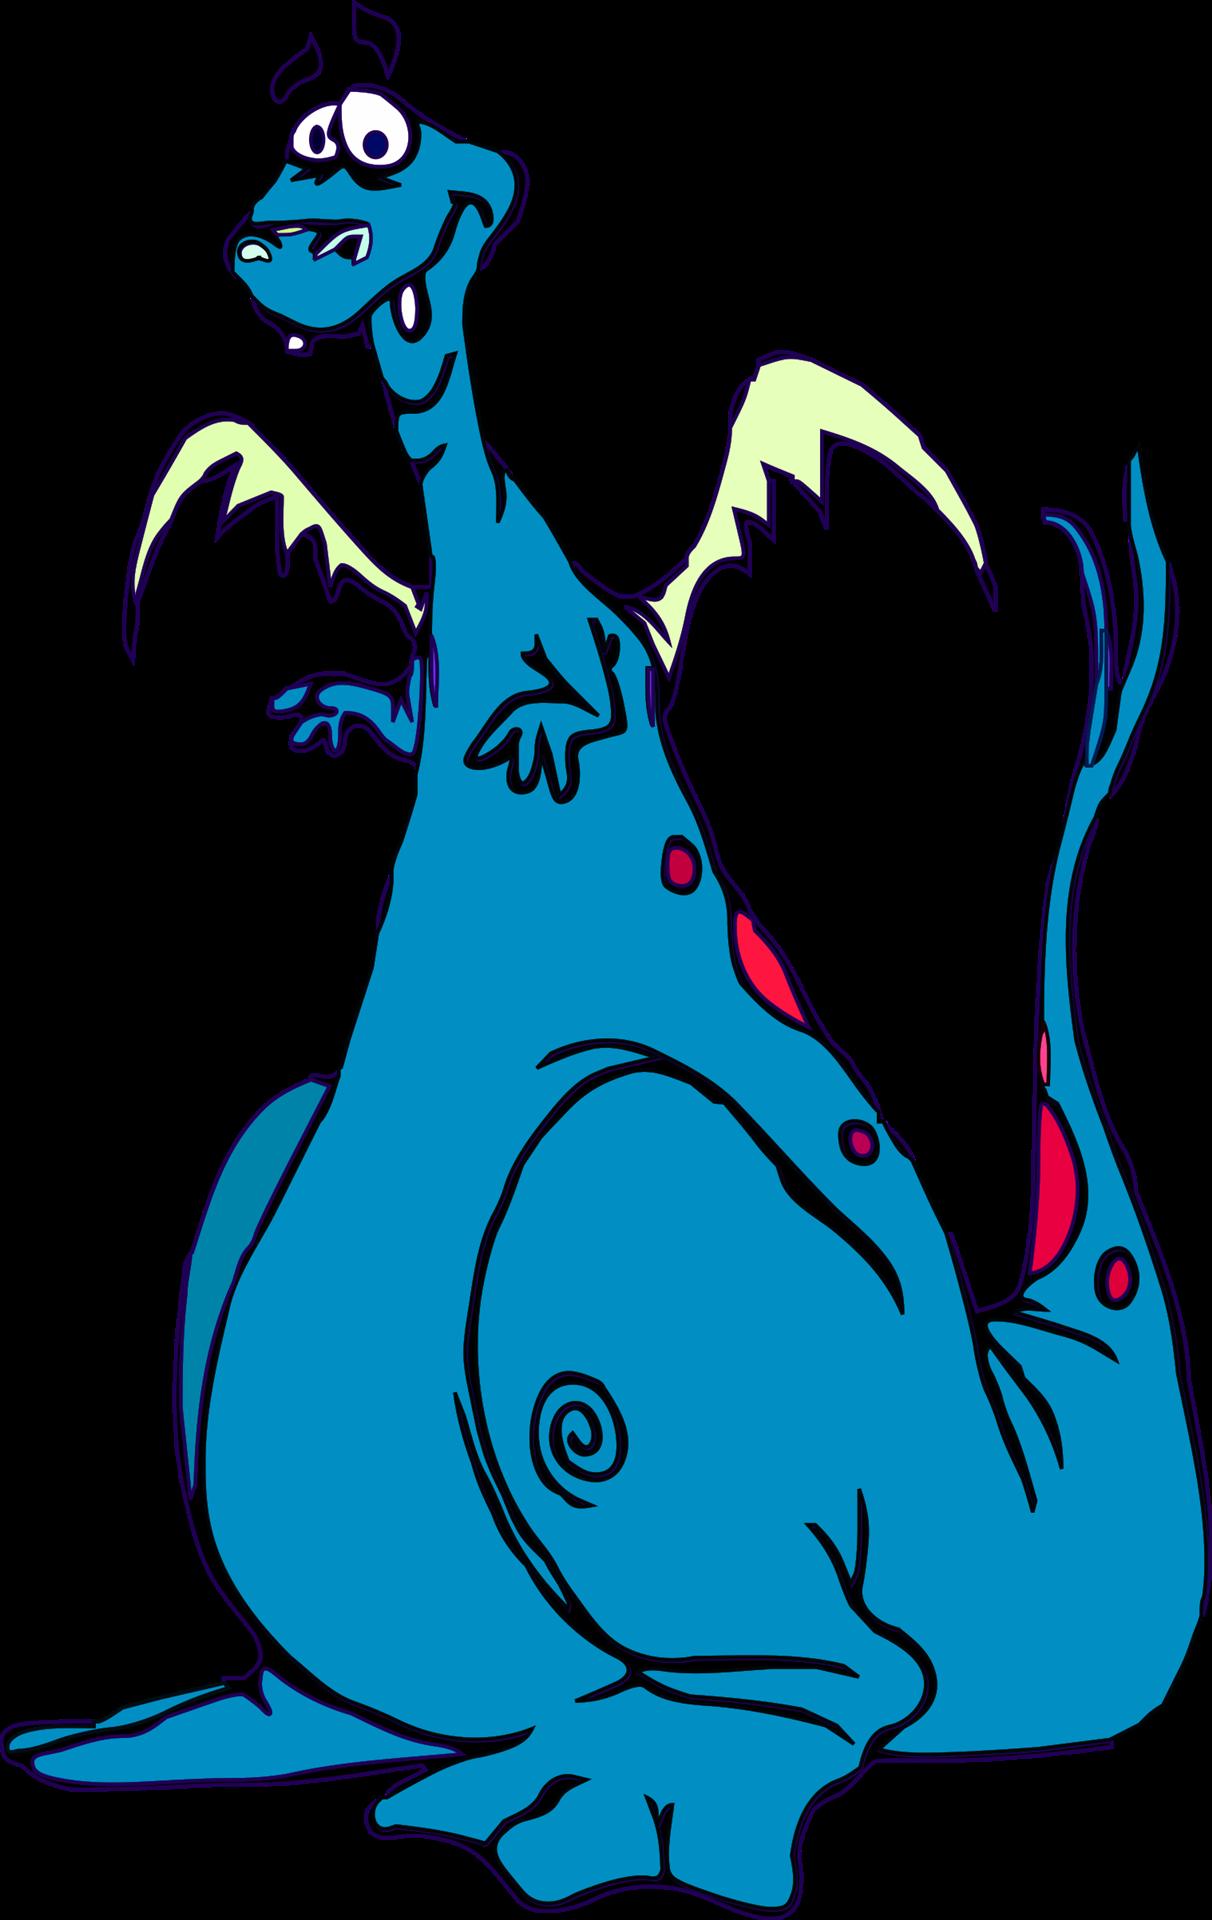 dragon-1210880